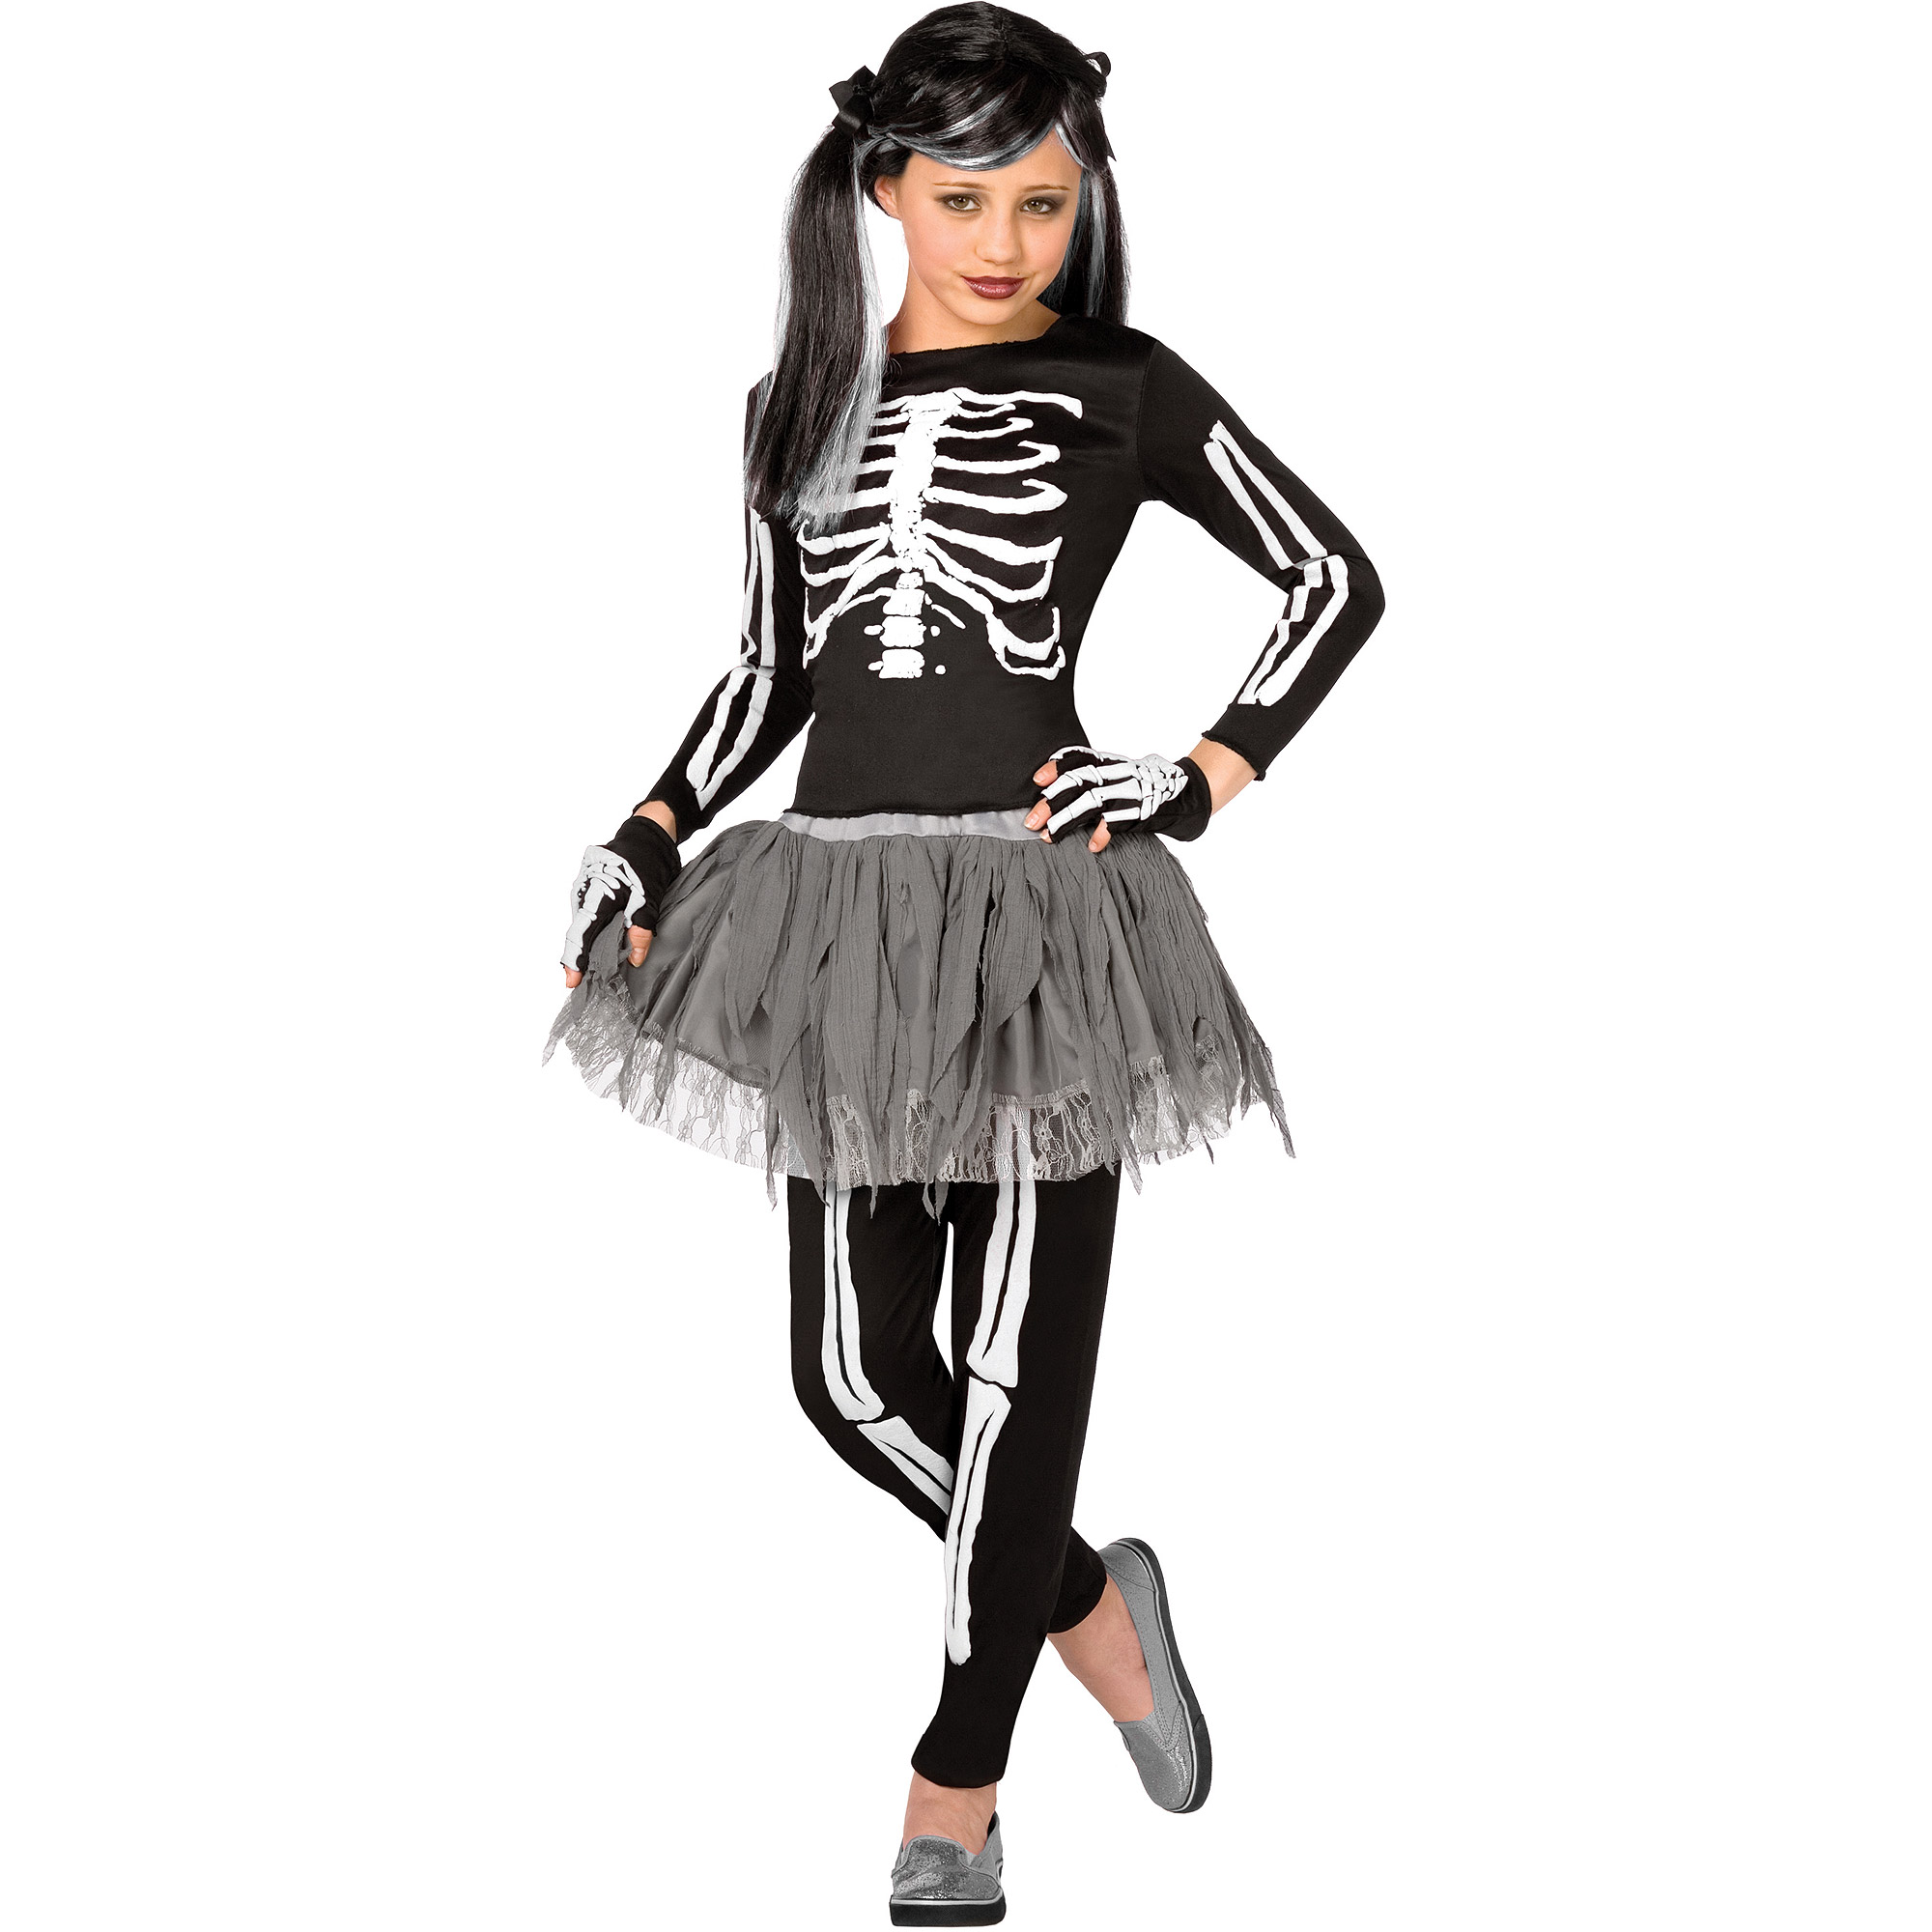 White Skeleton Child Halloween Costume